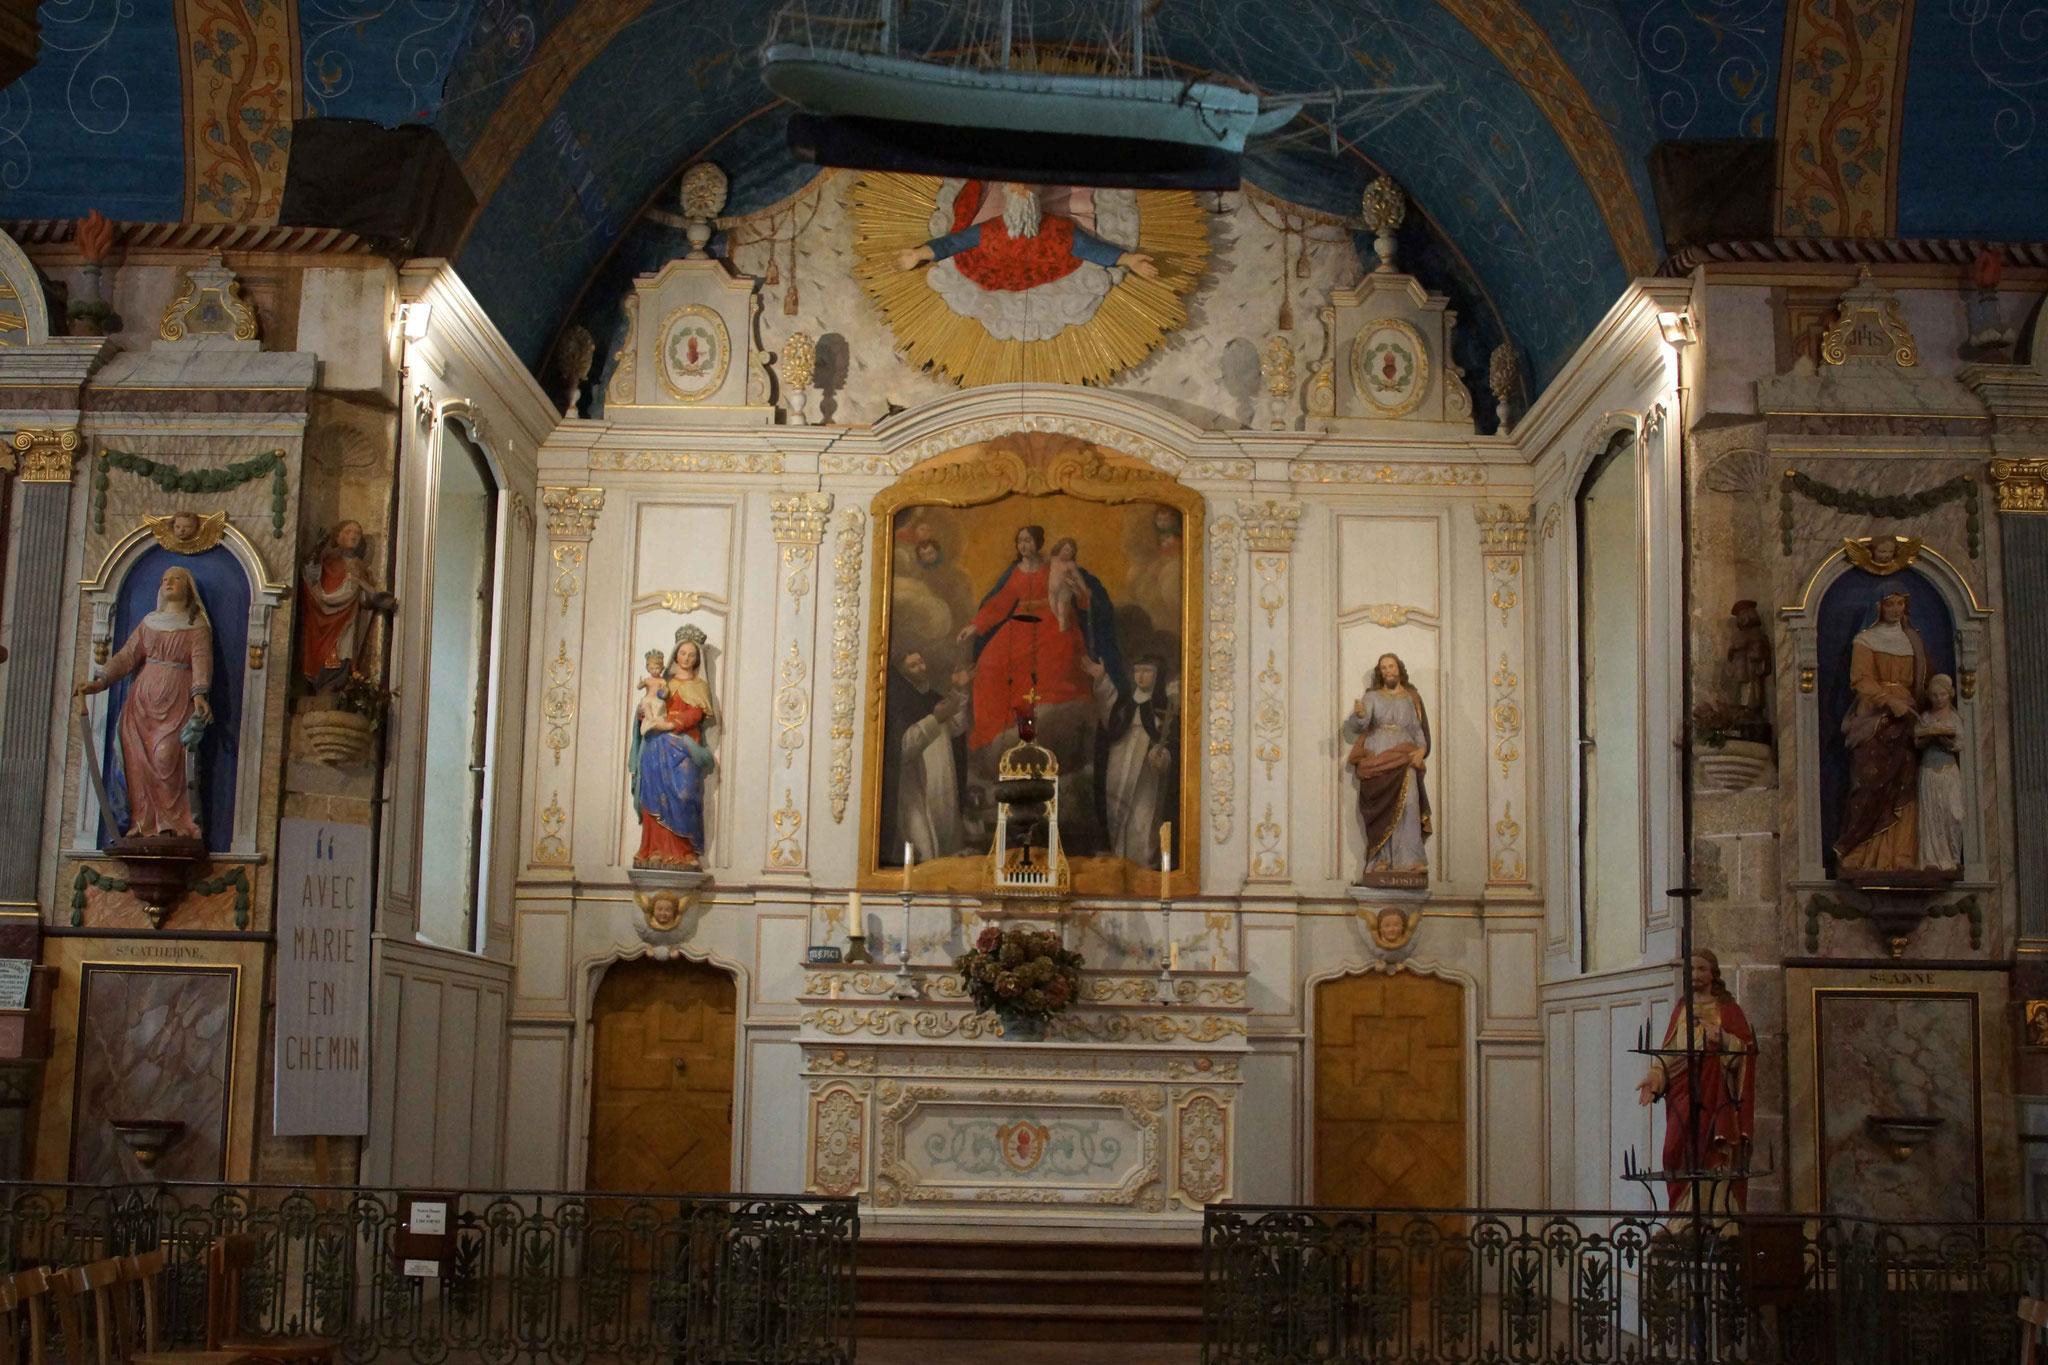 Chapelle de Liscorno, à Lannebert